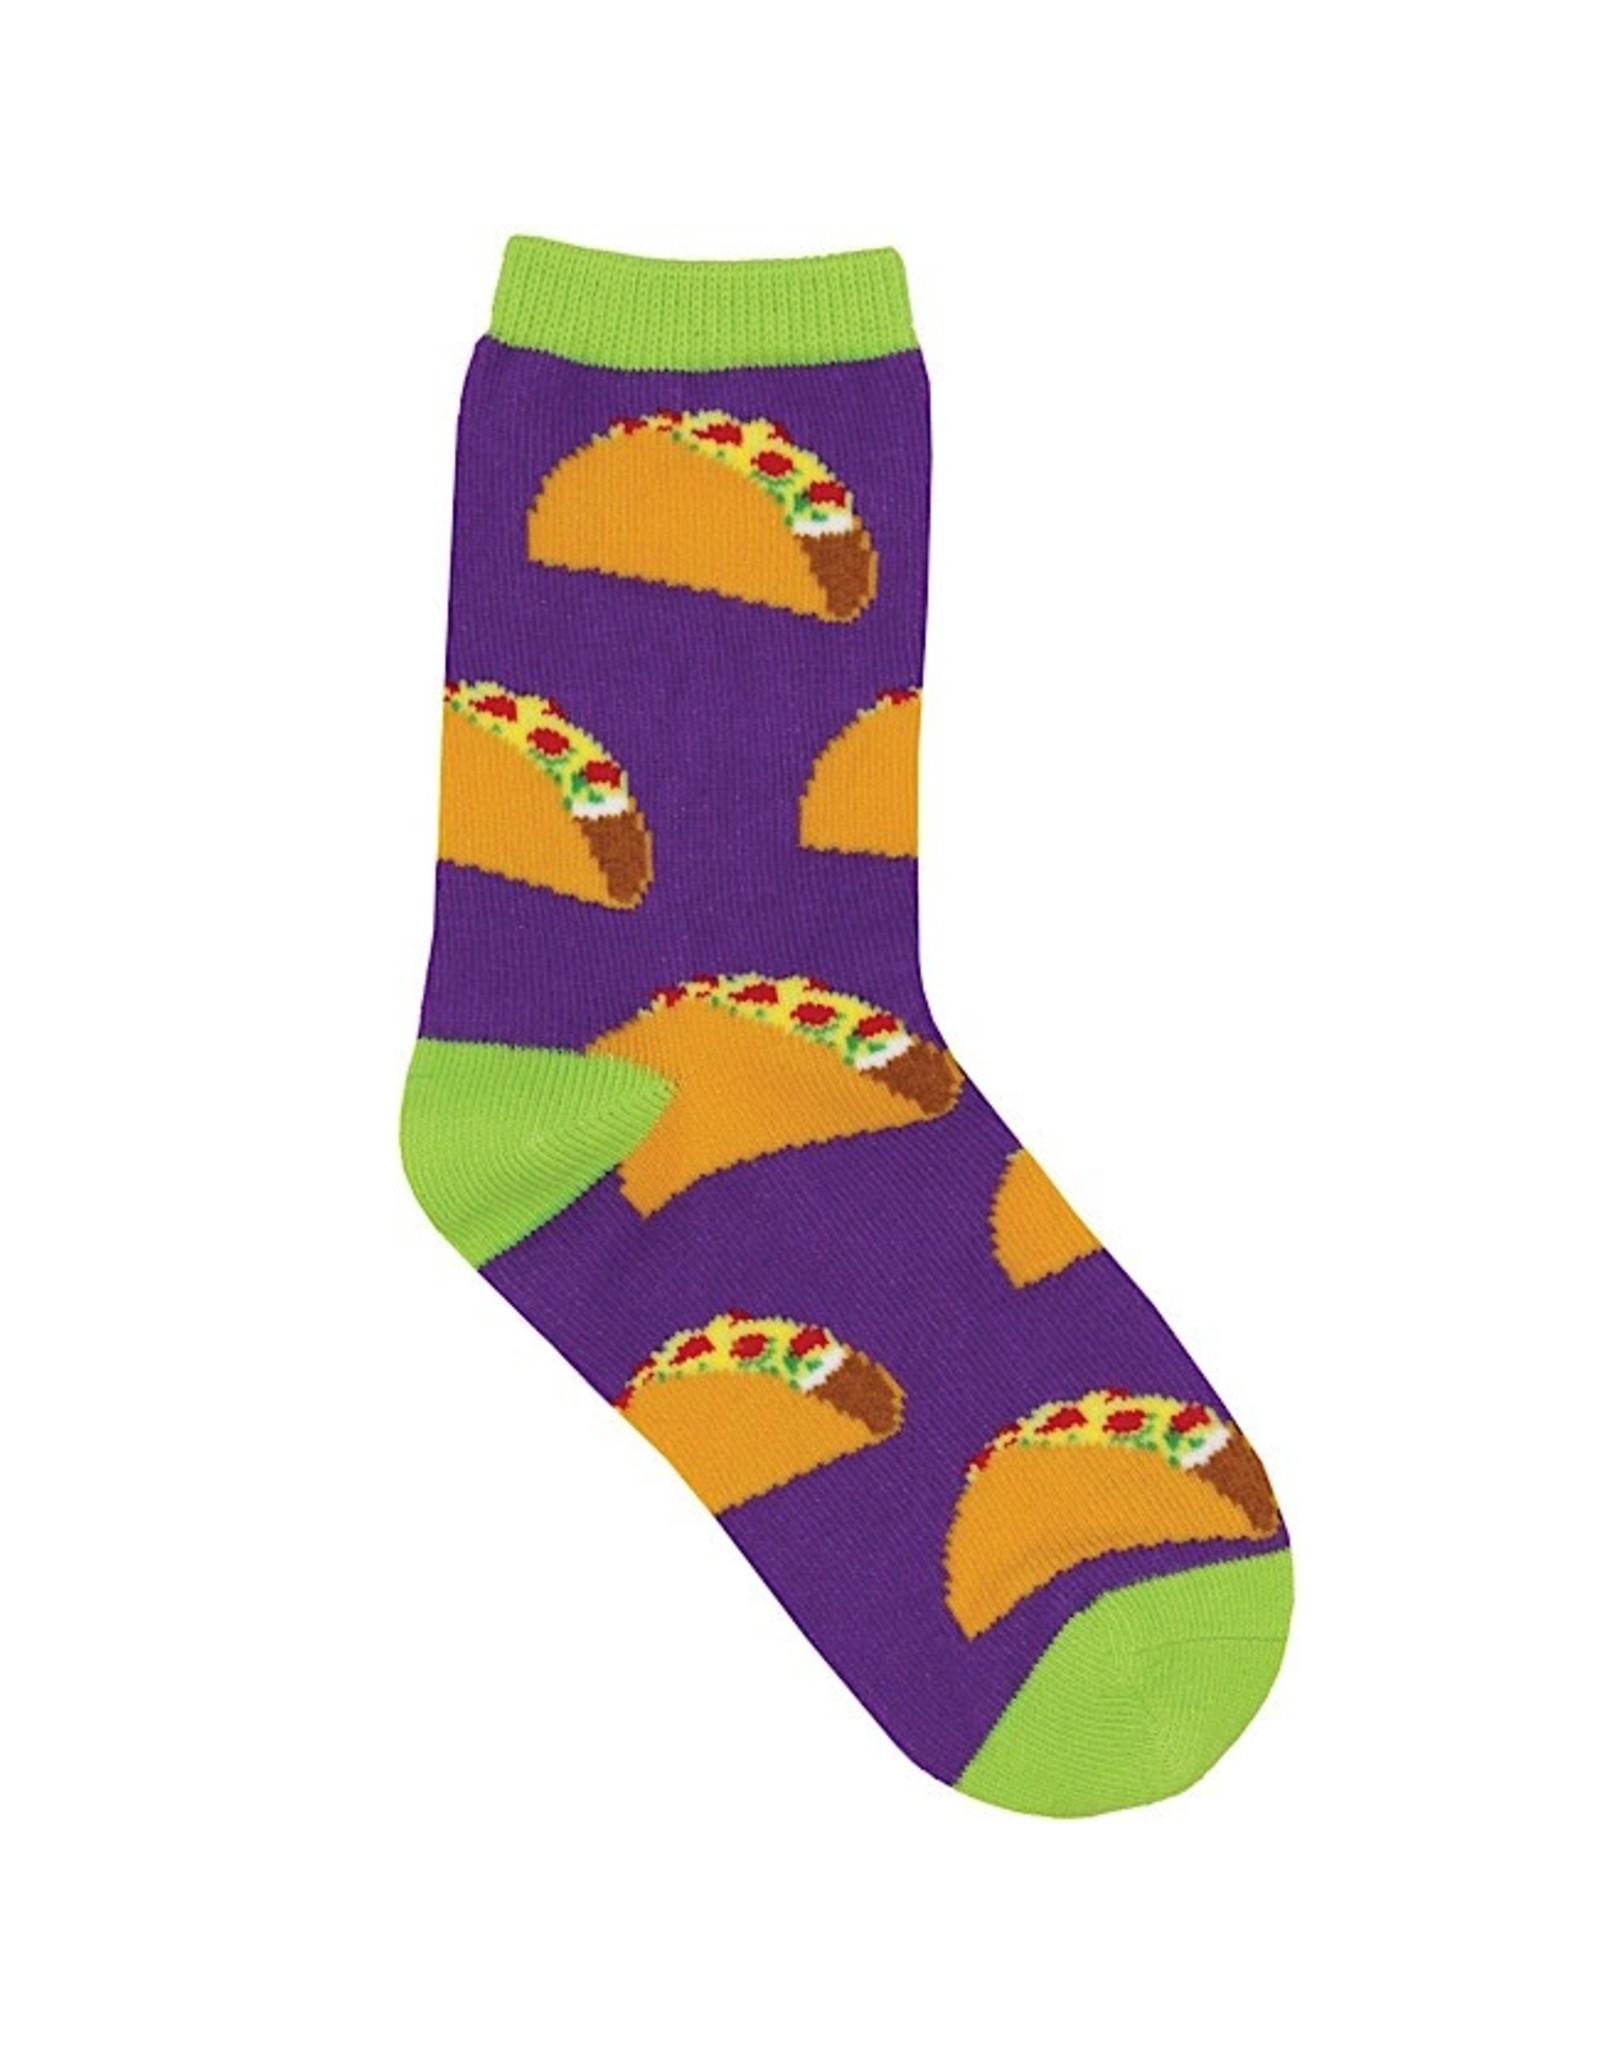 Kids Socks - Tacos